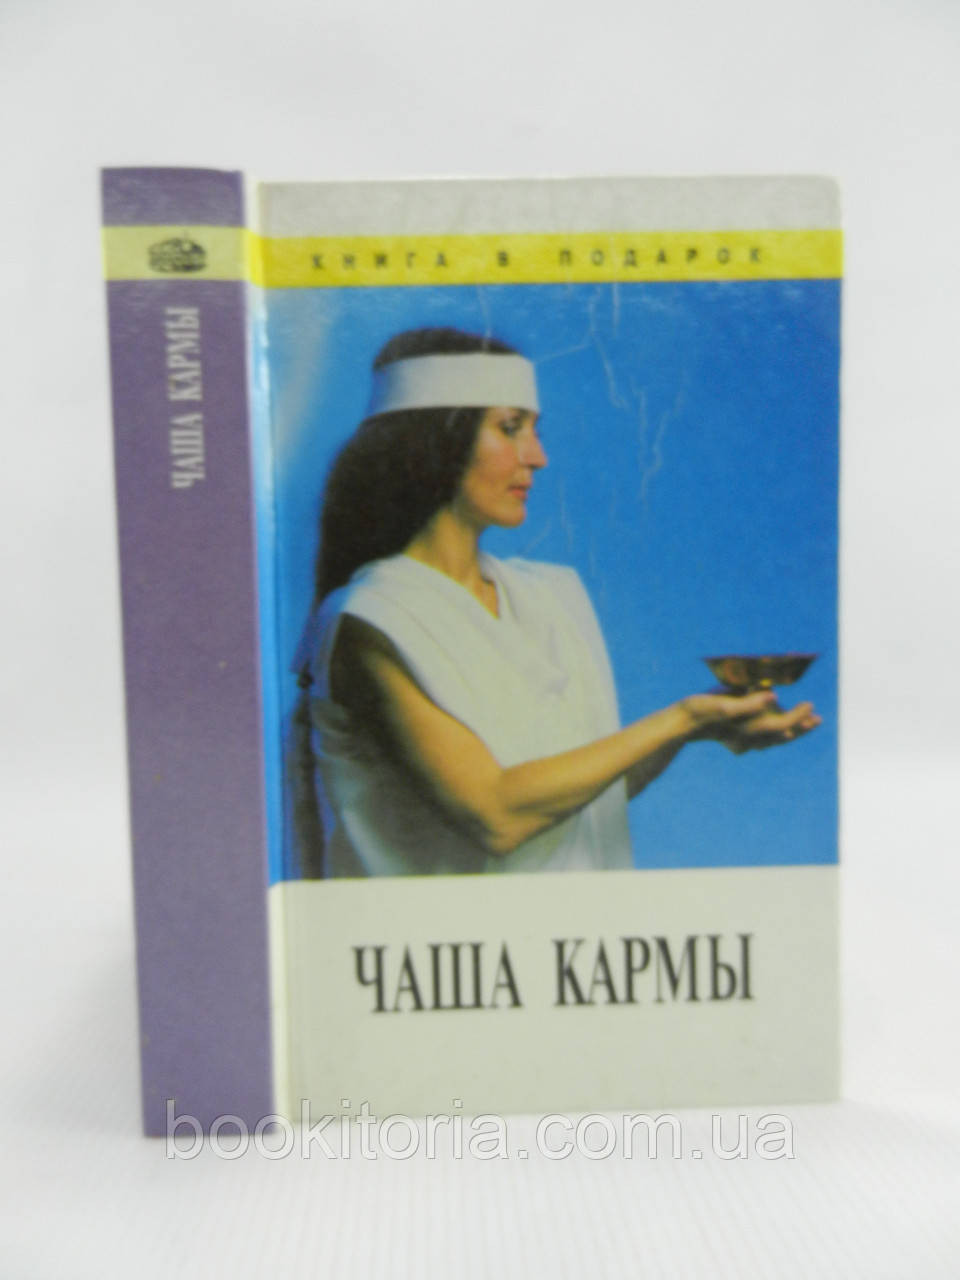 Богданович В. Чаша кармы (б/у).